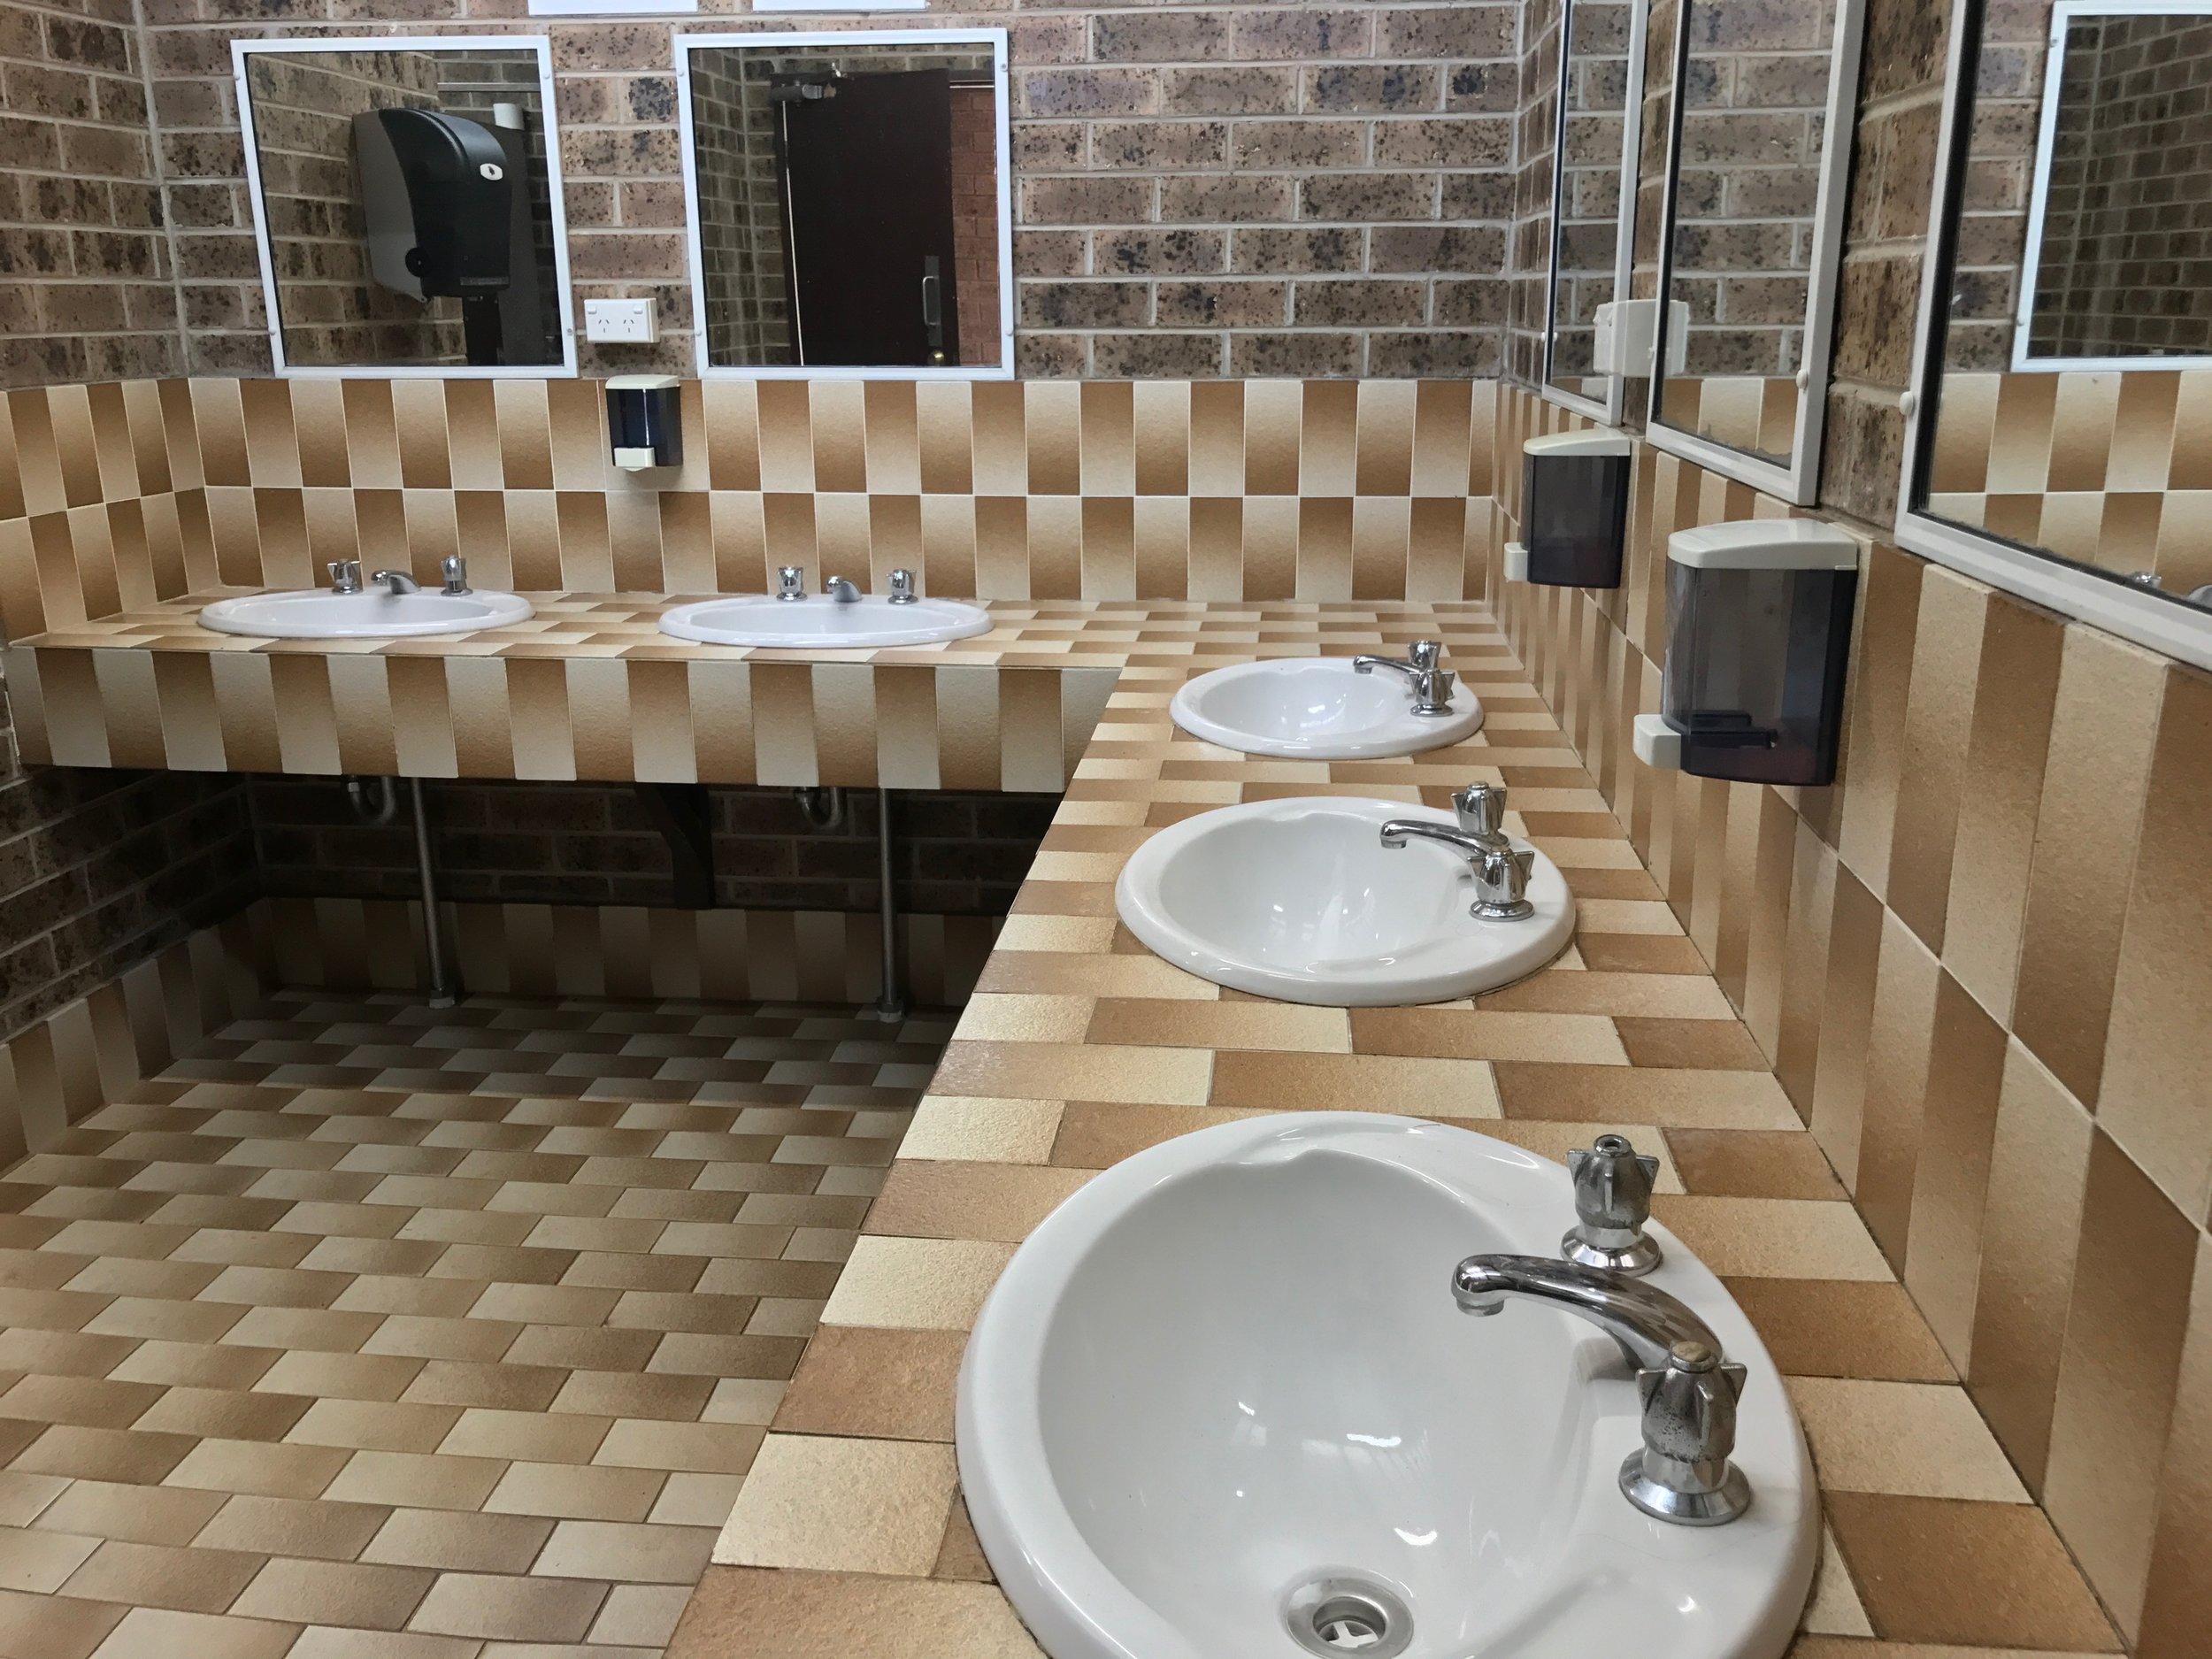 Amenity block basins